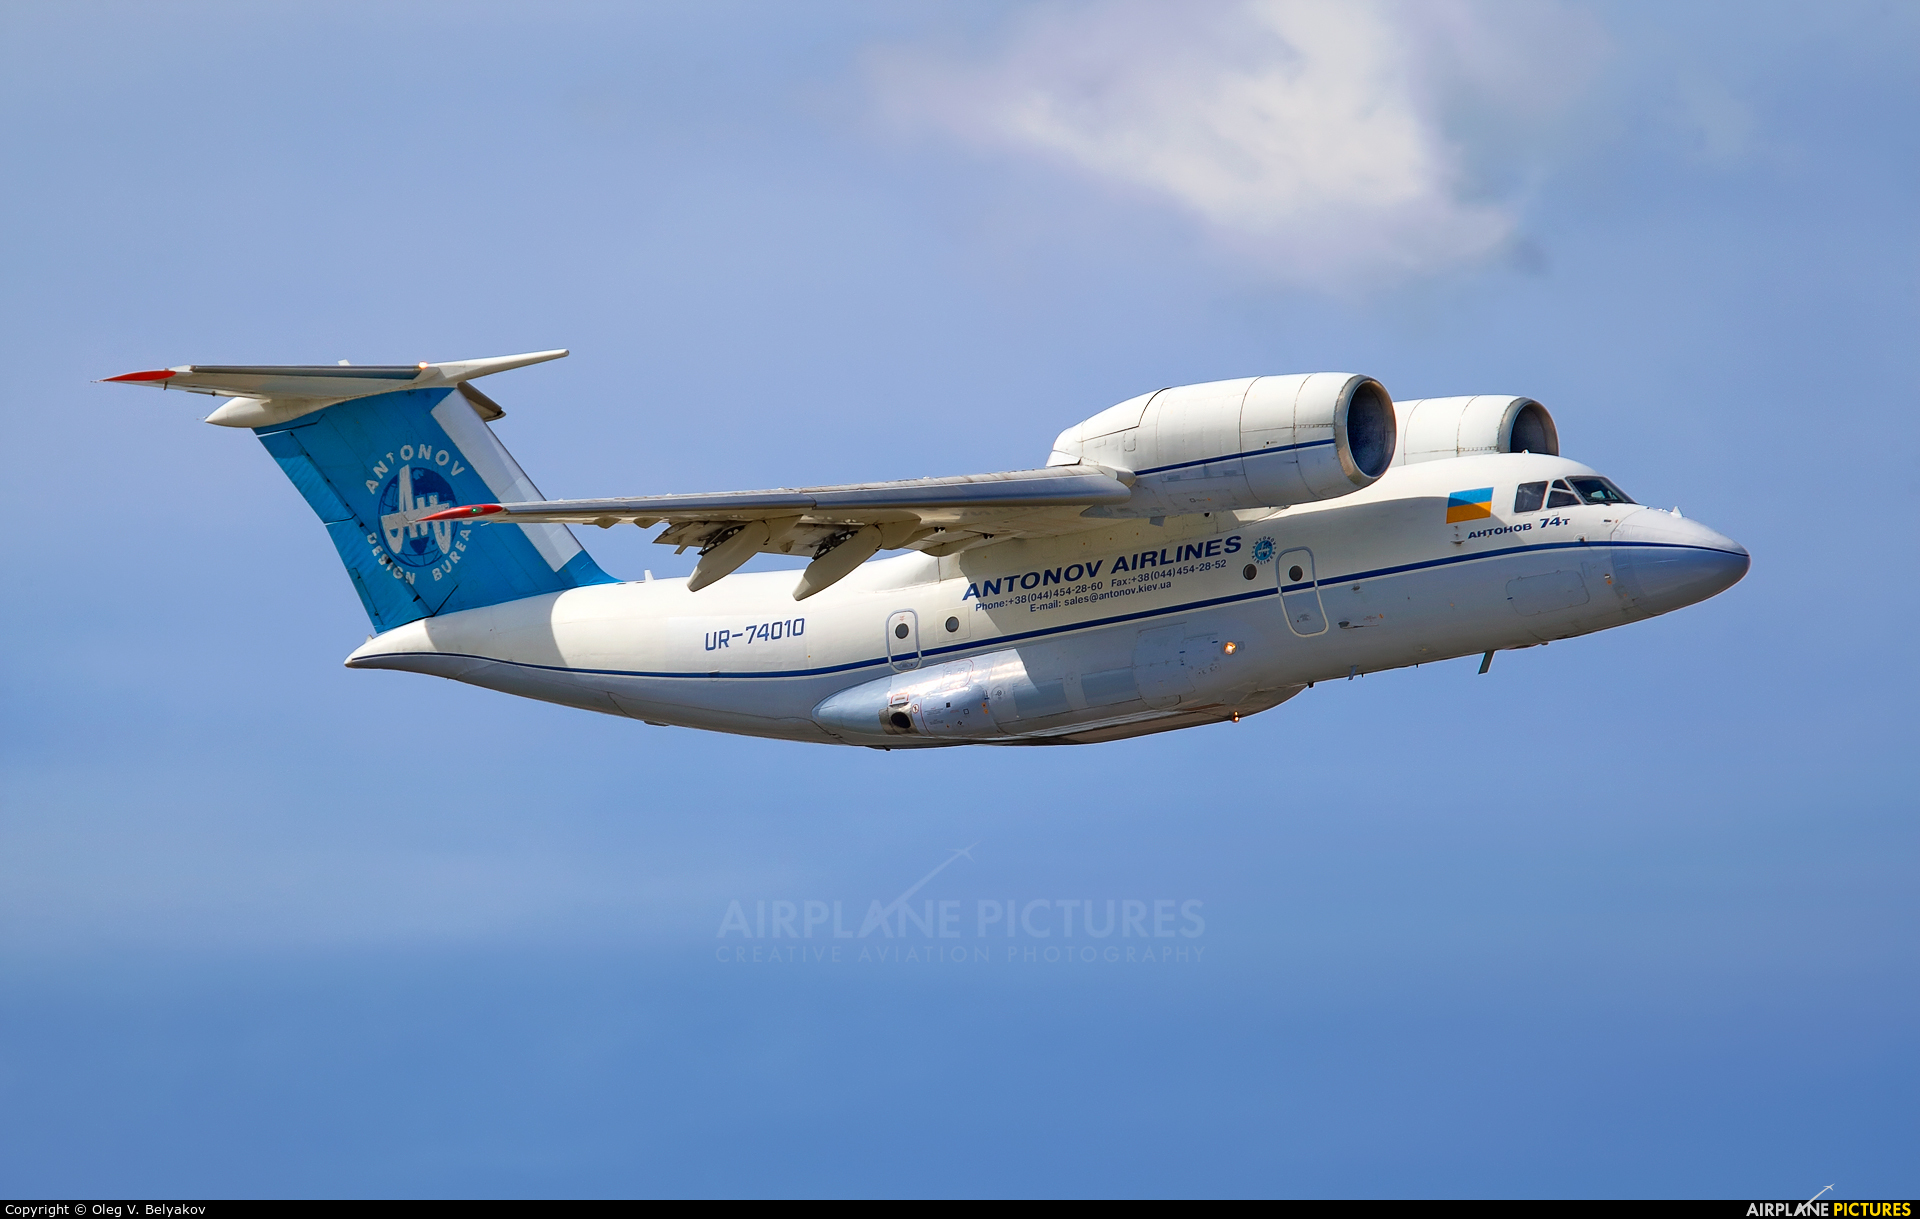 Antonov Airlines /  Design Bureau UR-74010 aircraft at Kyiv - Gostomel